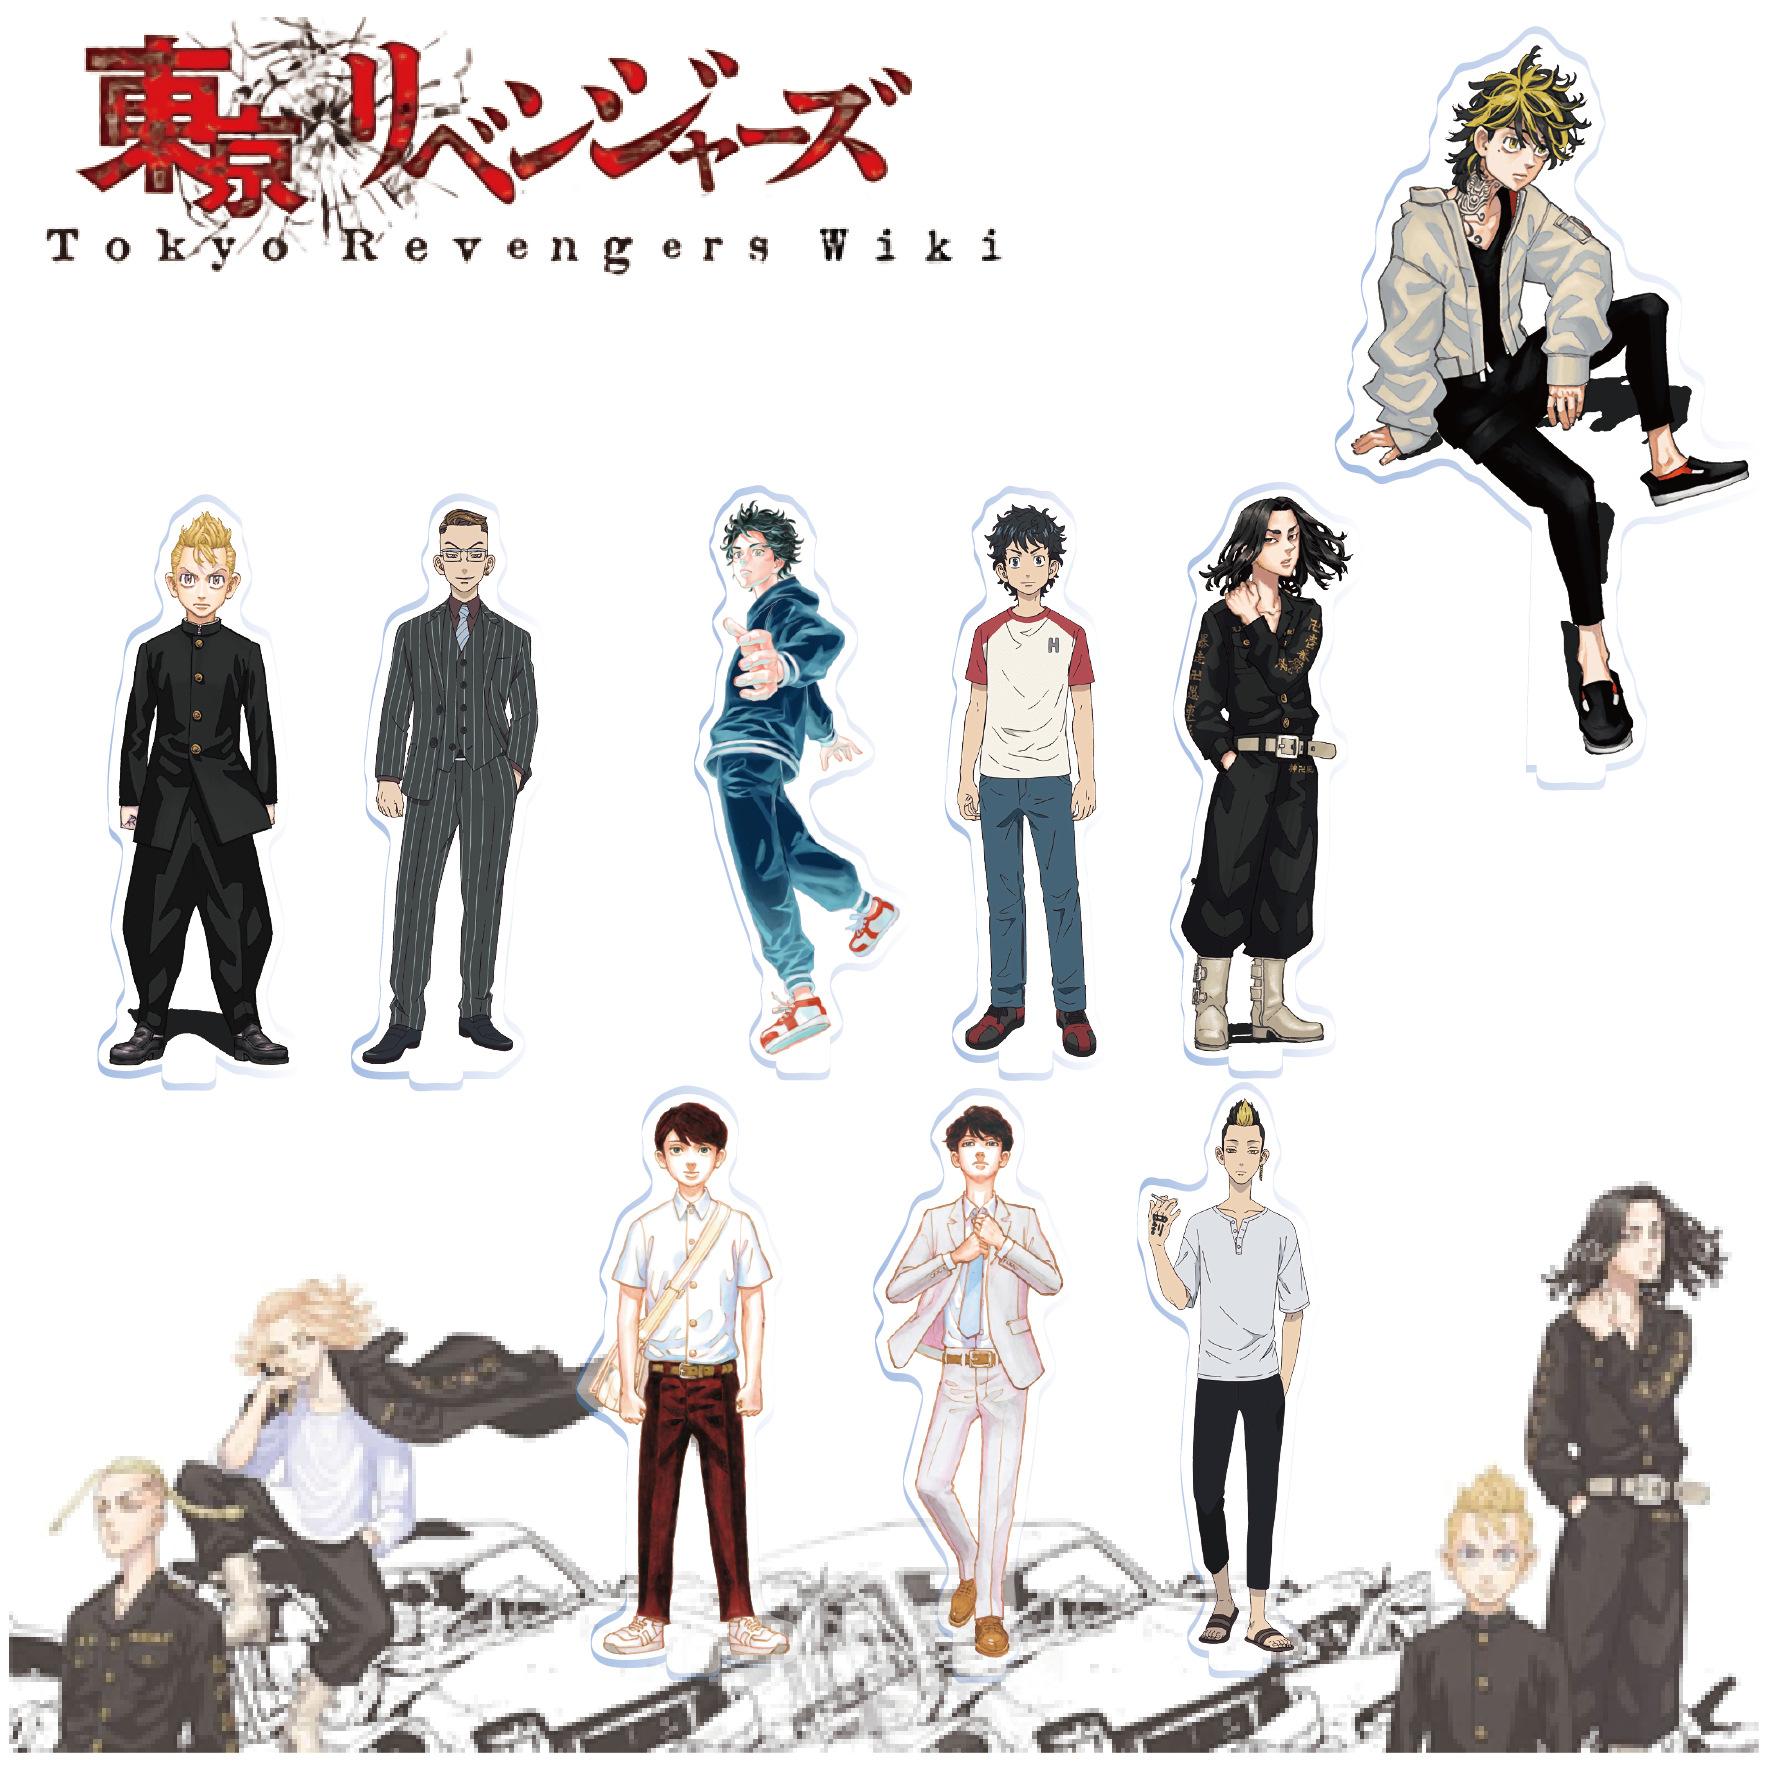 Mainan Action Figure Tokyo Revengers Manjiro Sano Ryuguji Draken Mikey Bahan Akrilik Ukuran 15cm Untuk Dekorasi